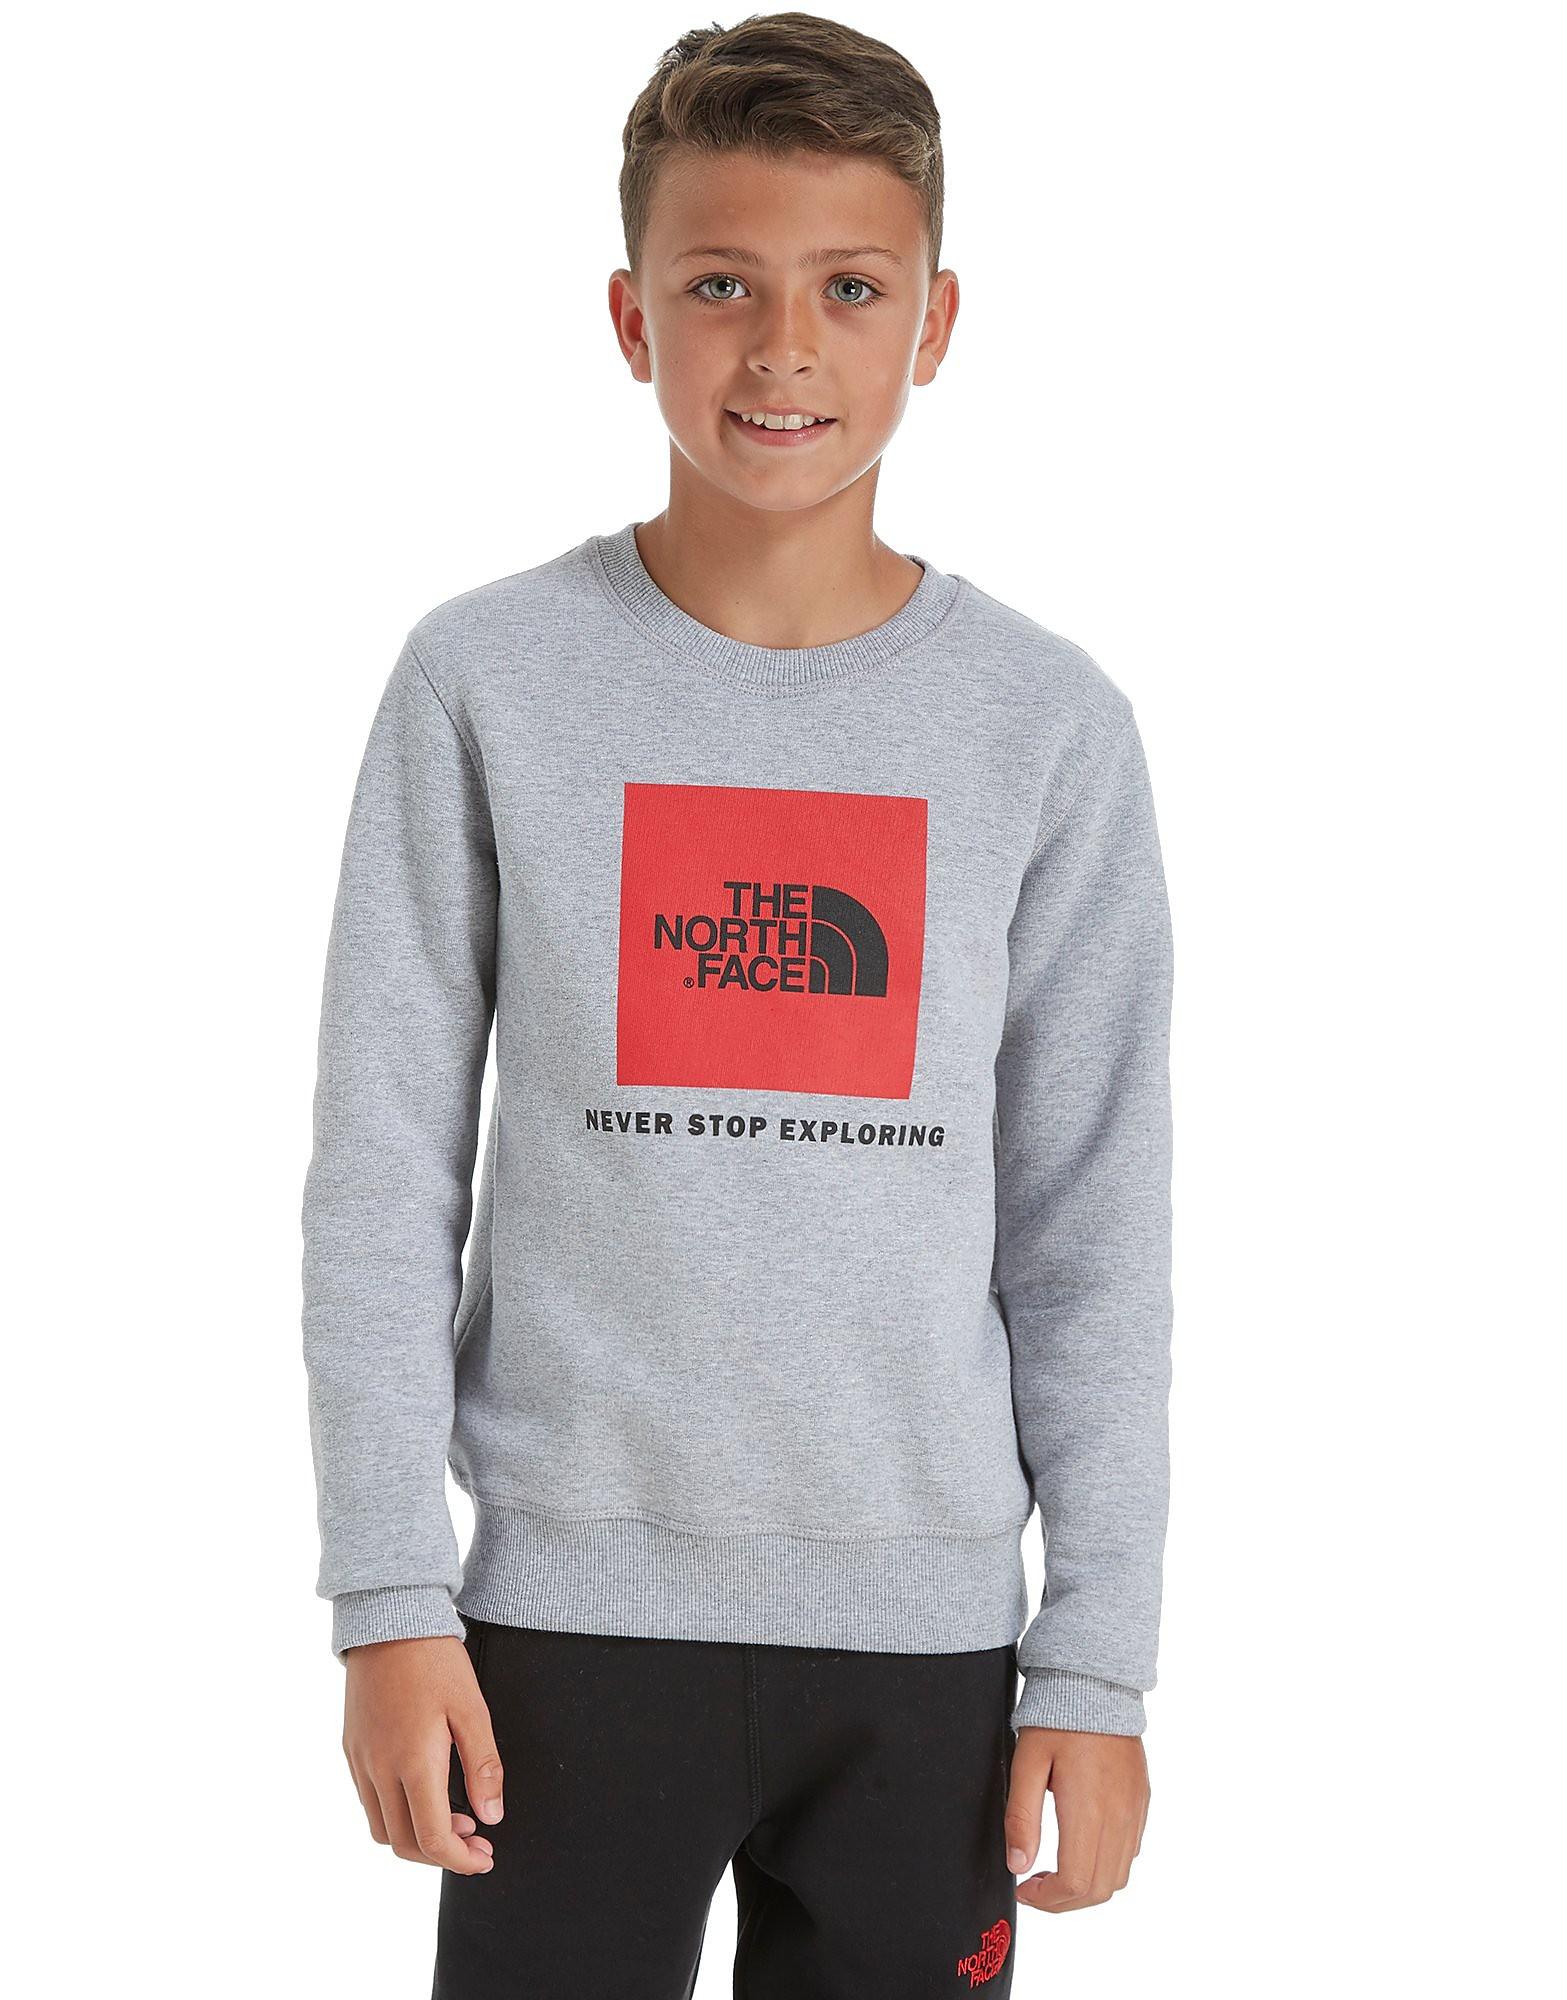 The North Face Boy's Box Crew Sweatshirt Junior